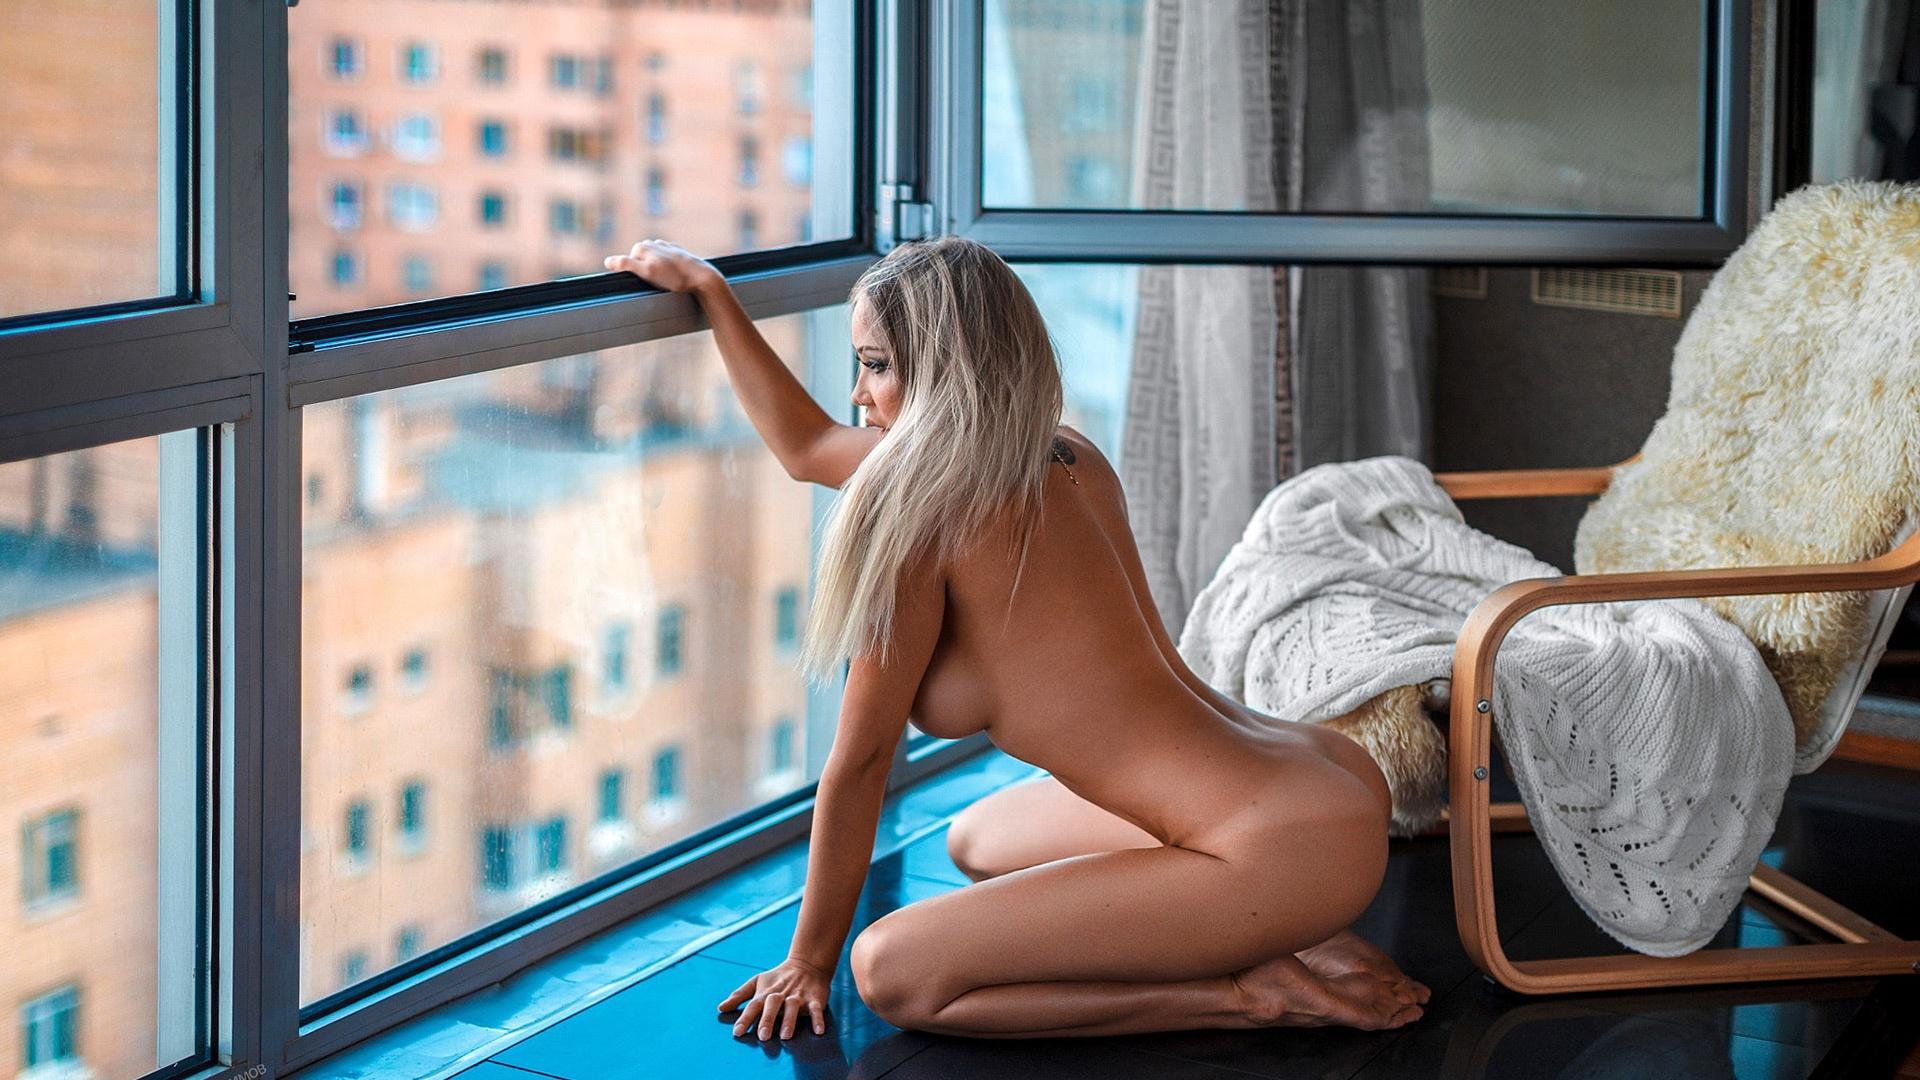 Black hair girl domination porn